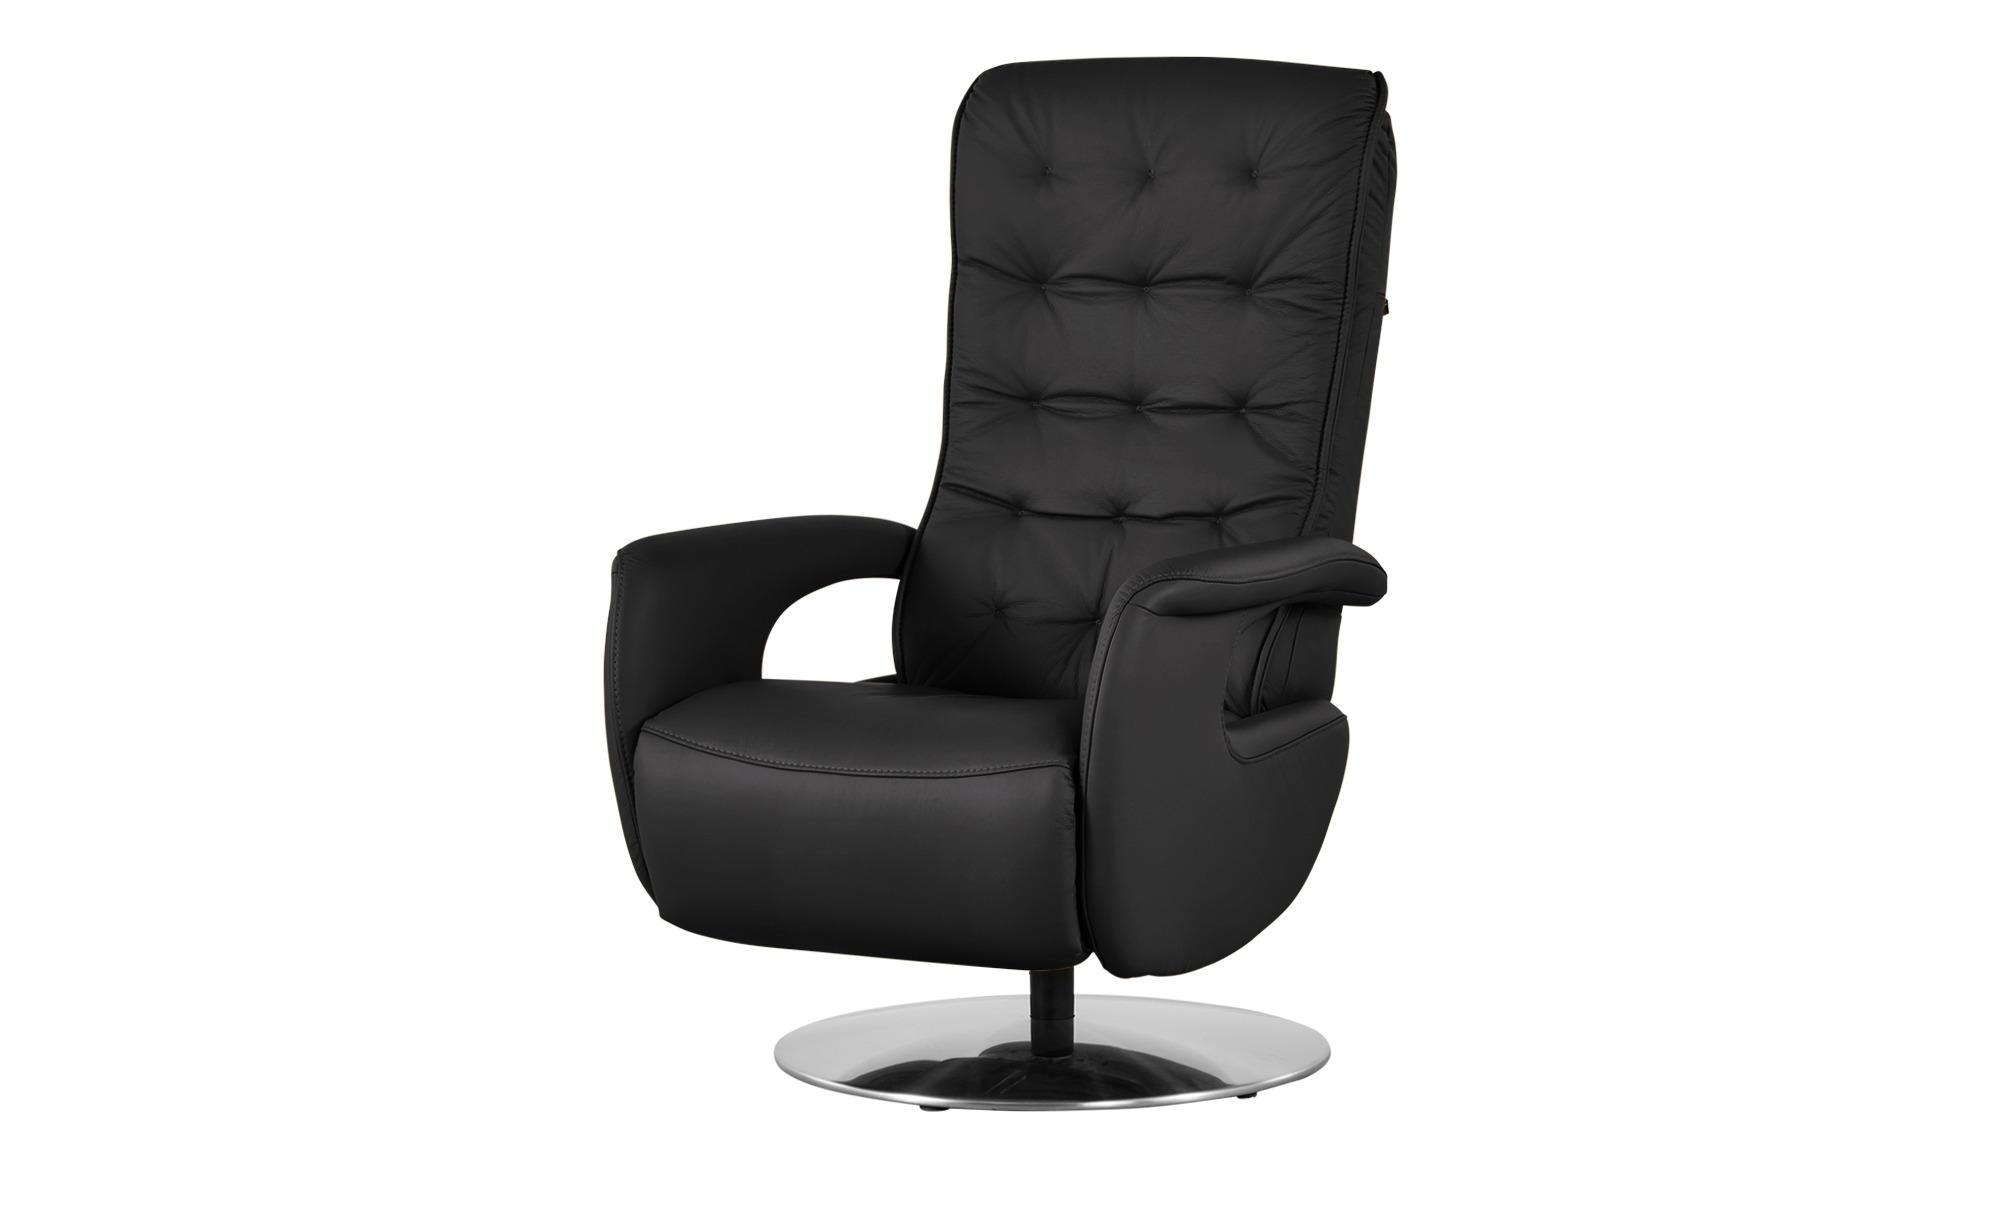 Hukla Relaxsessel  Smilla ¦ schwarz ¦ Maße (cm): B: 72 H: 113 T: 83 Polstermöbel > Sessel > Ledersessel - Höffner